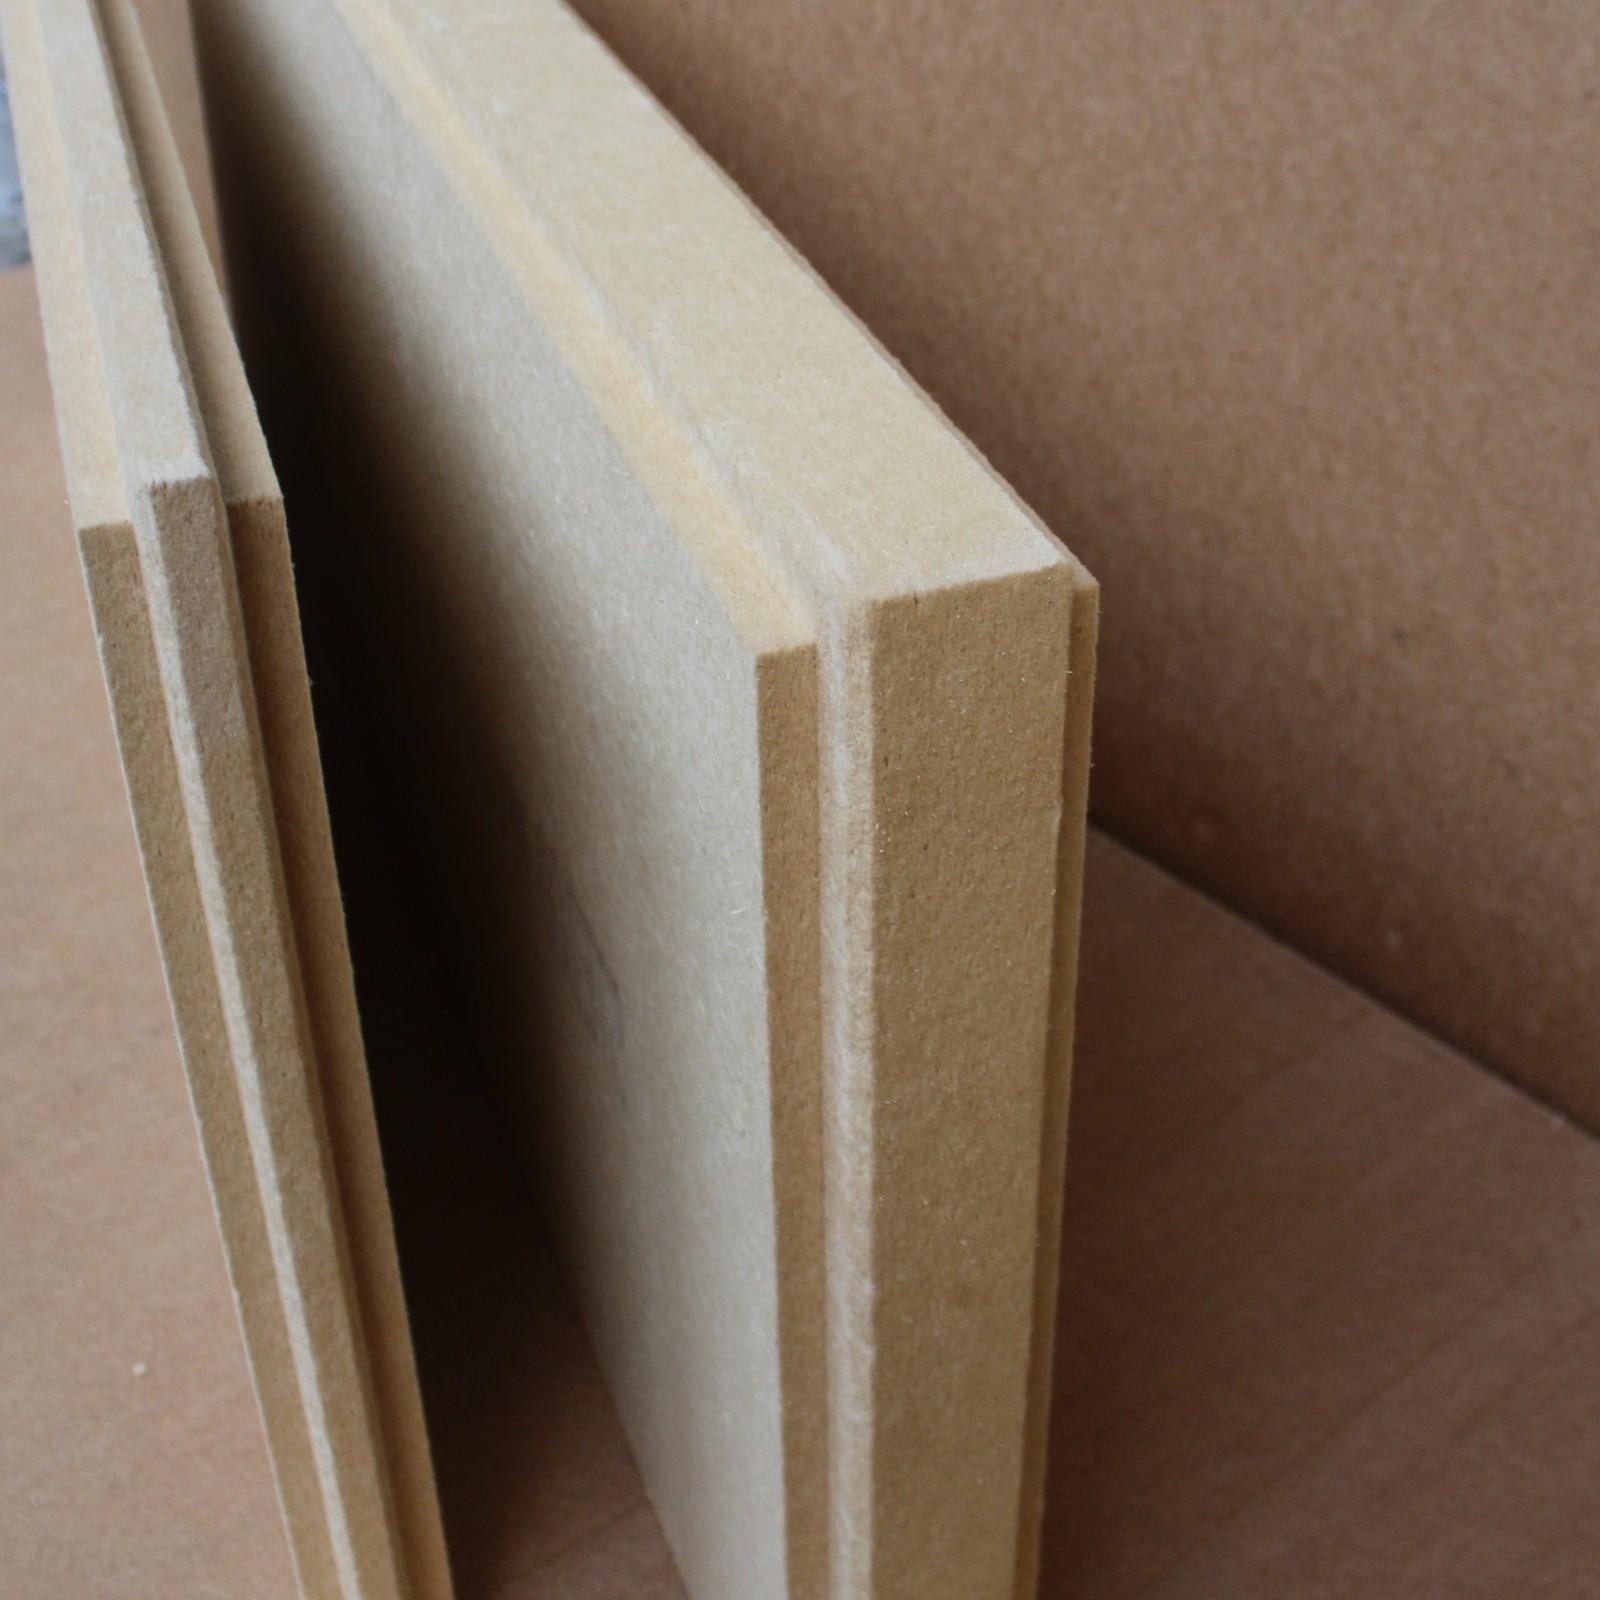 STEICO protect dry 160 mm 4-seitig Nut und Feder